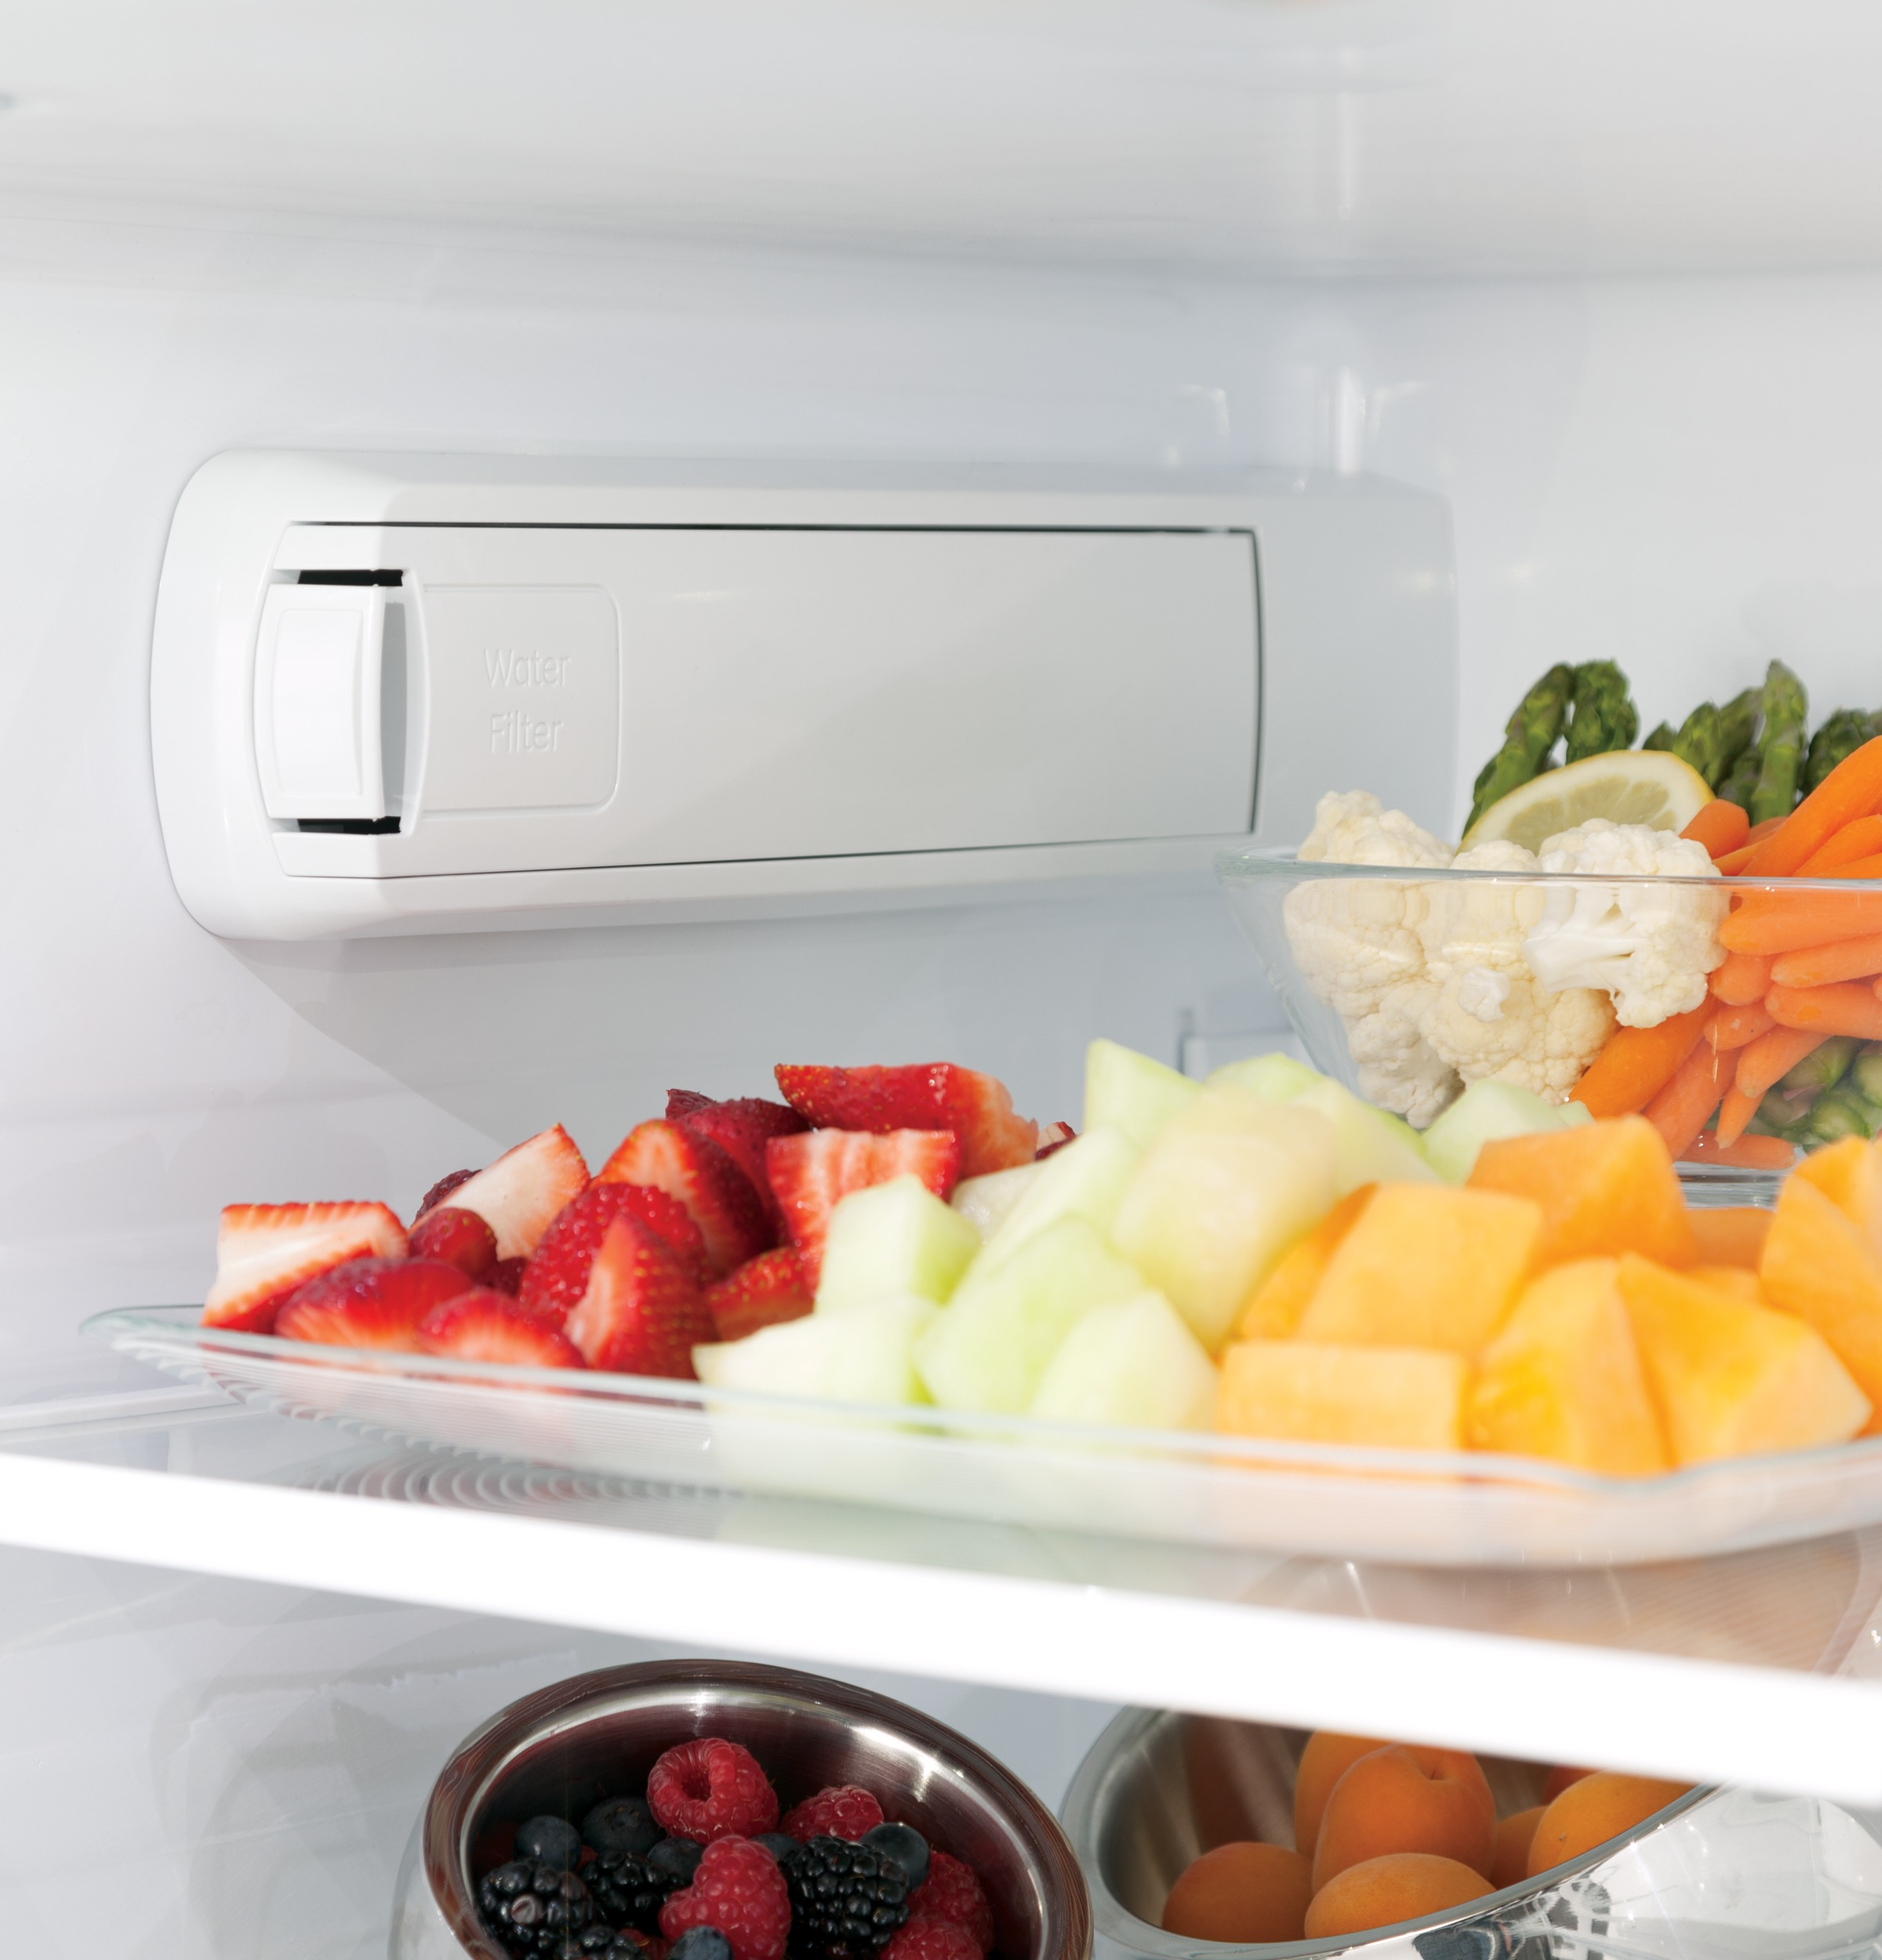 GE Appliances GNE29GSKSS 28.7 cu. ft. French Door Refrigerator - Stainless Steel